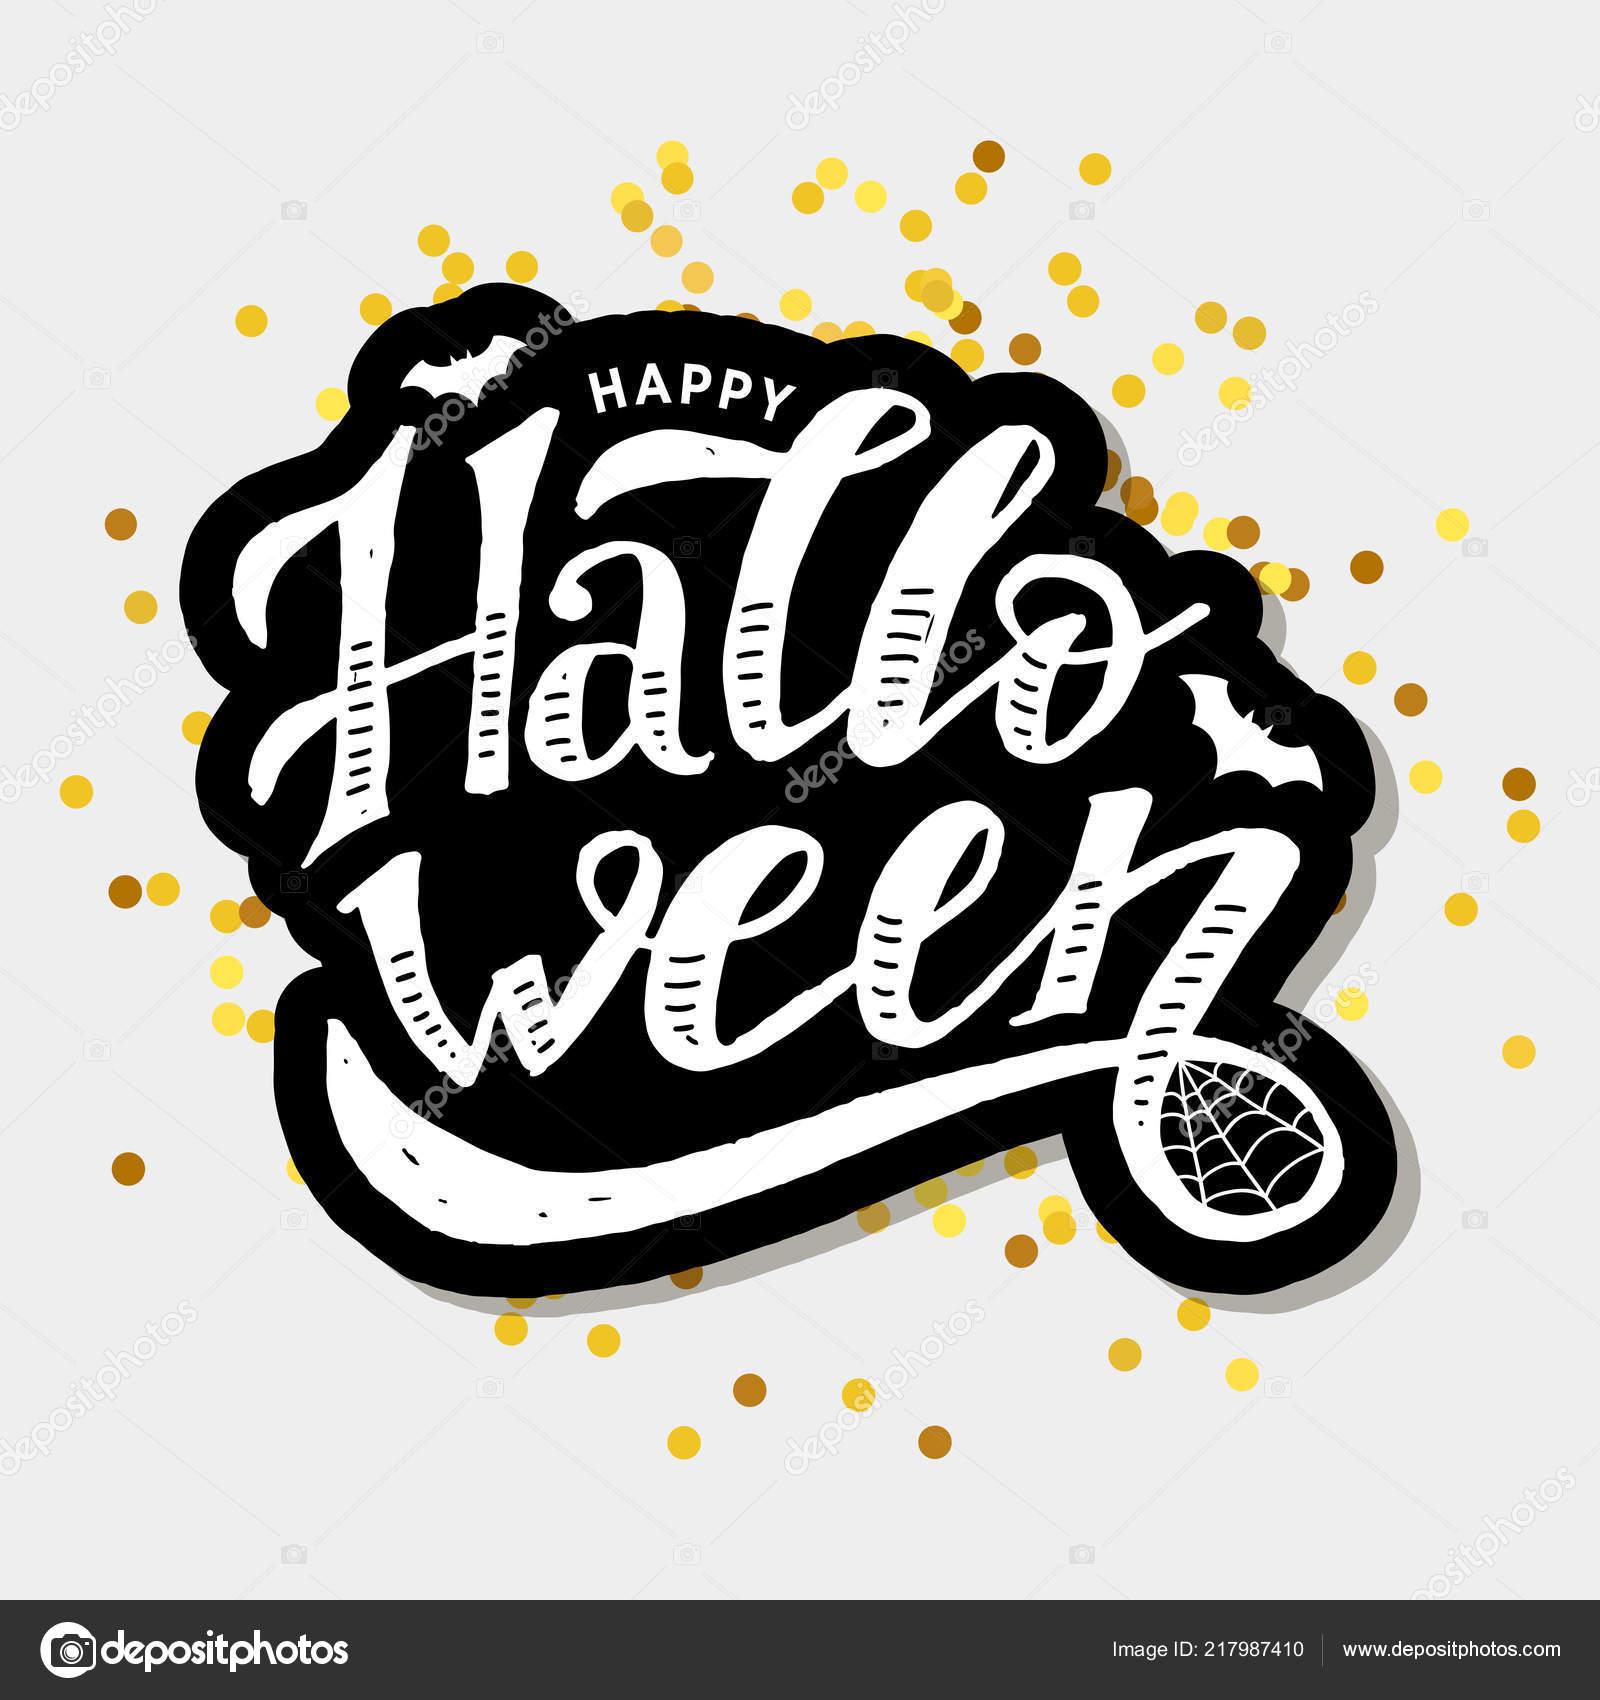 Happy Halloween Lettering Calligraphy Brush Text Holiday Illustration Gold Stock Photo C Lemonkey 217987410